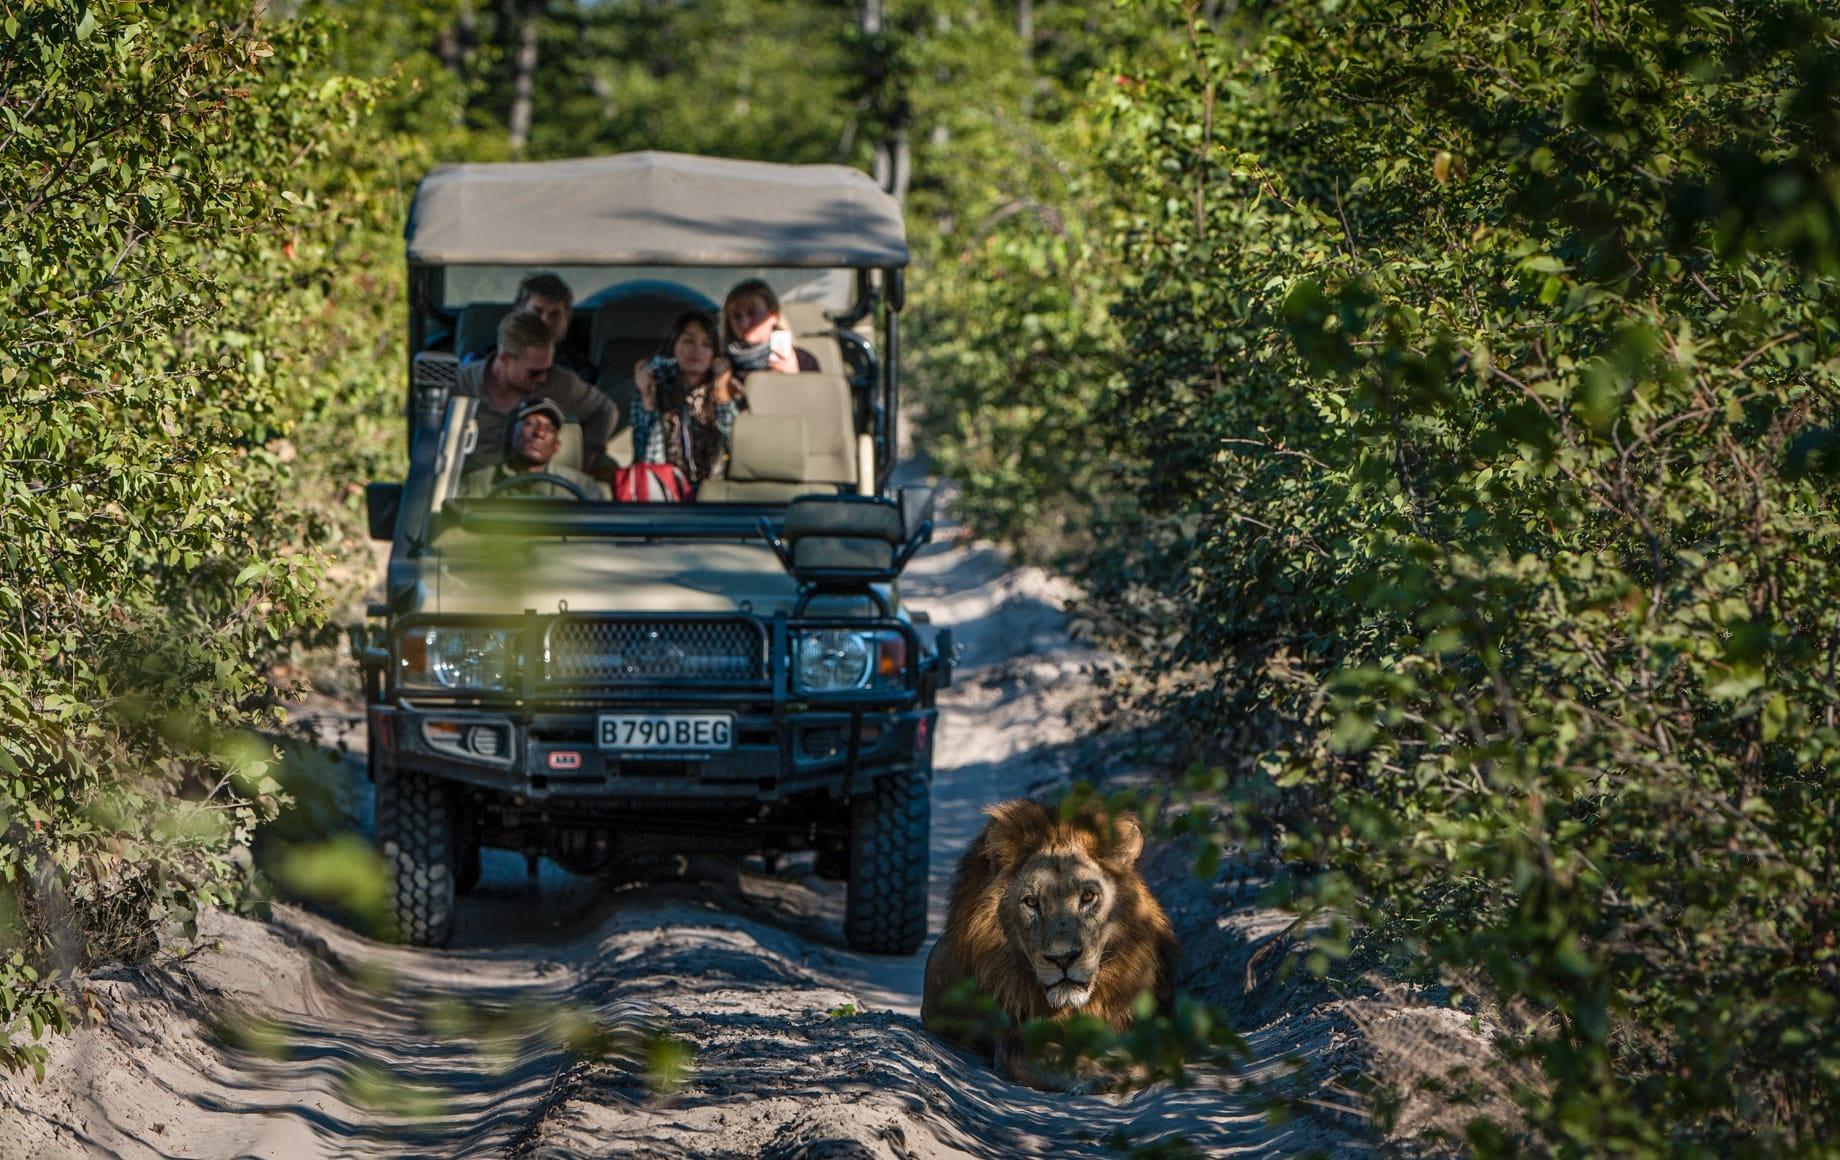 Lions during safari at Sable Alley - Okavango Delta, Botswana